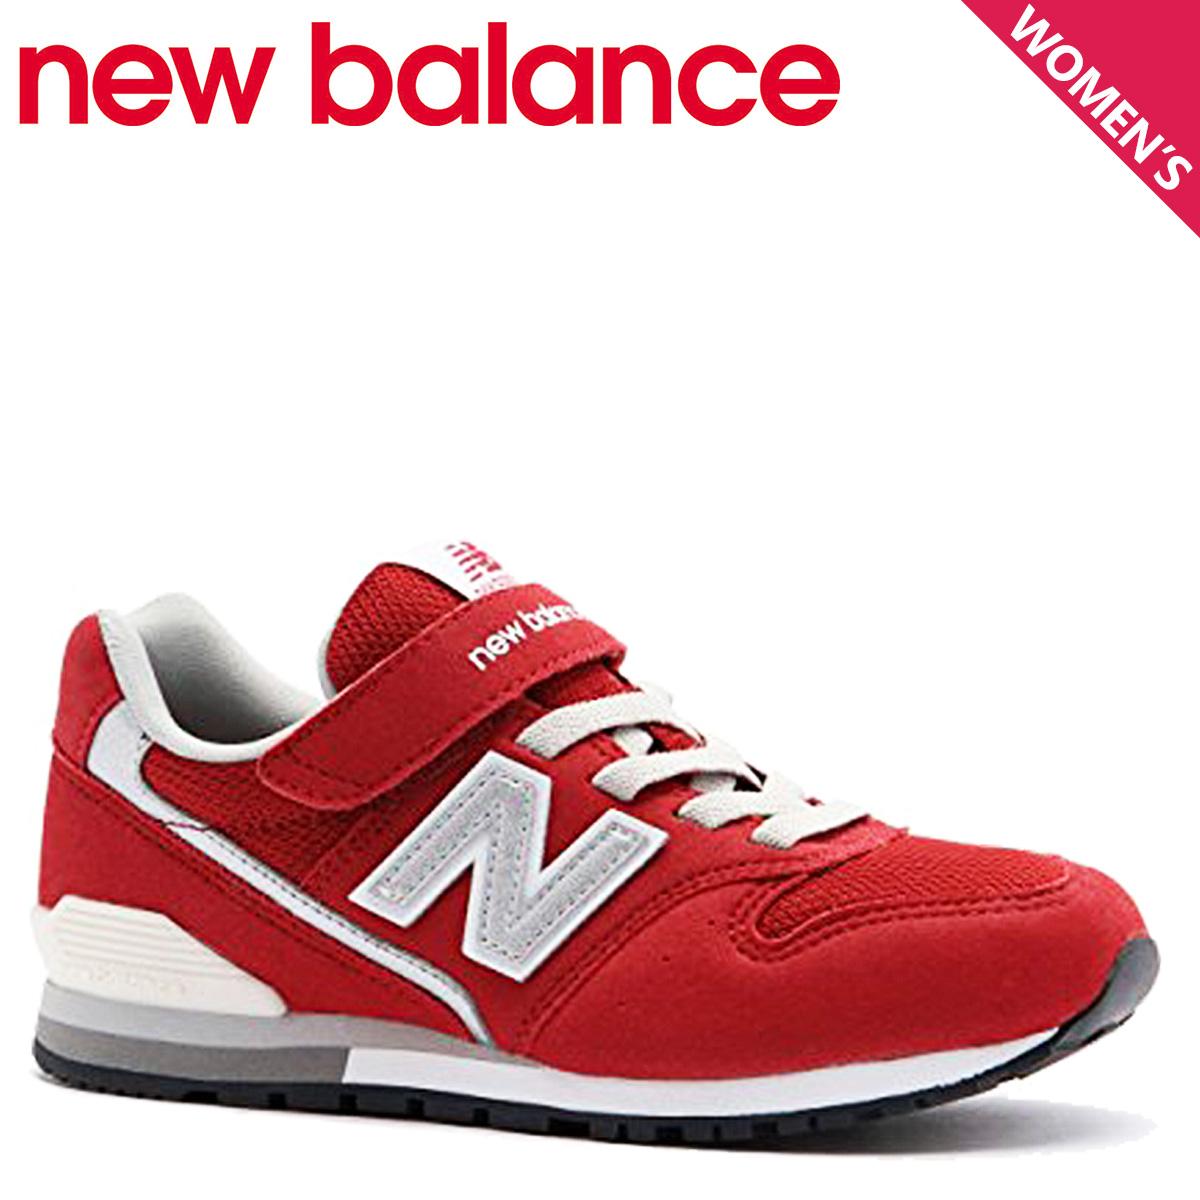 kids red new balance